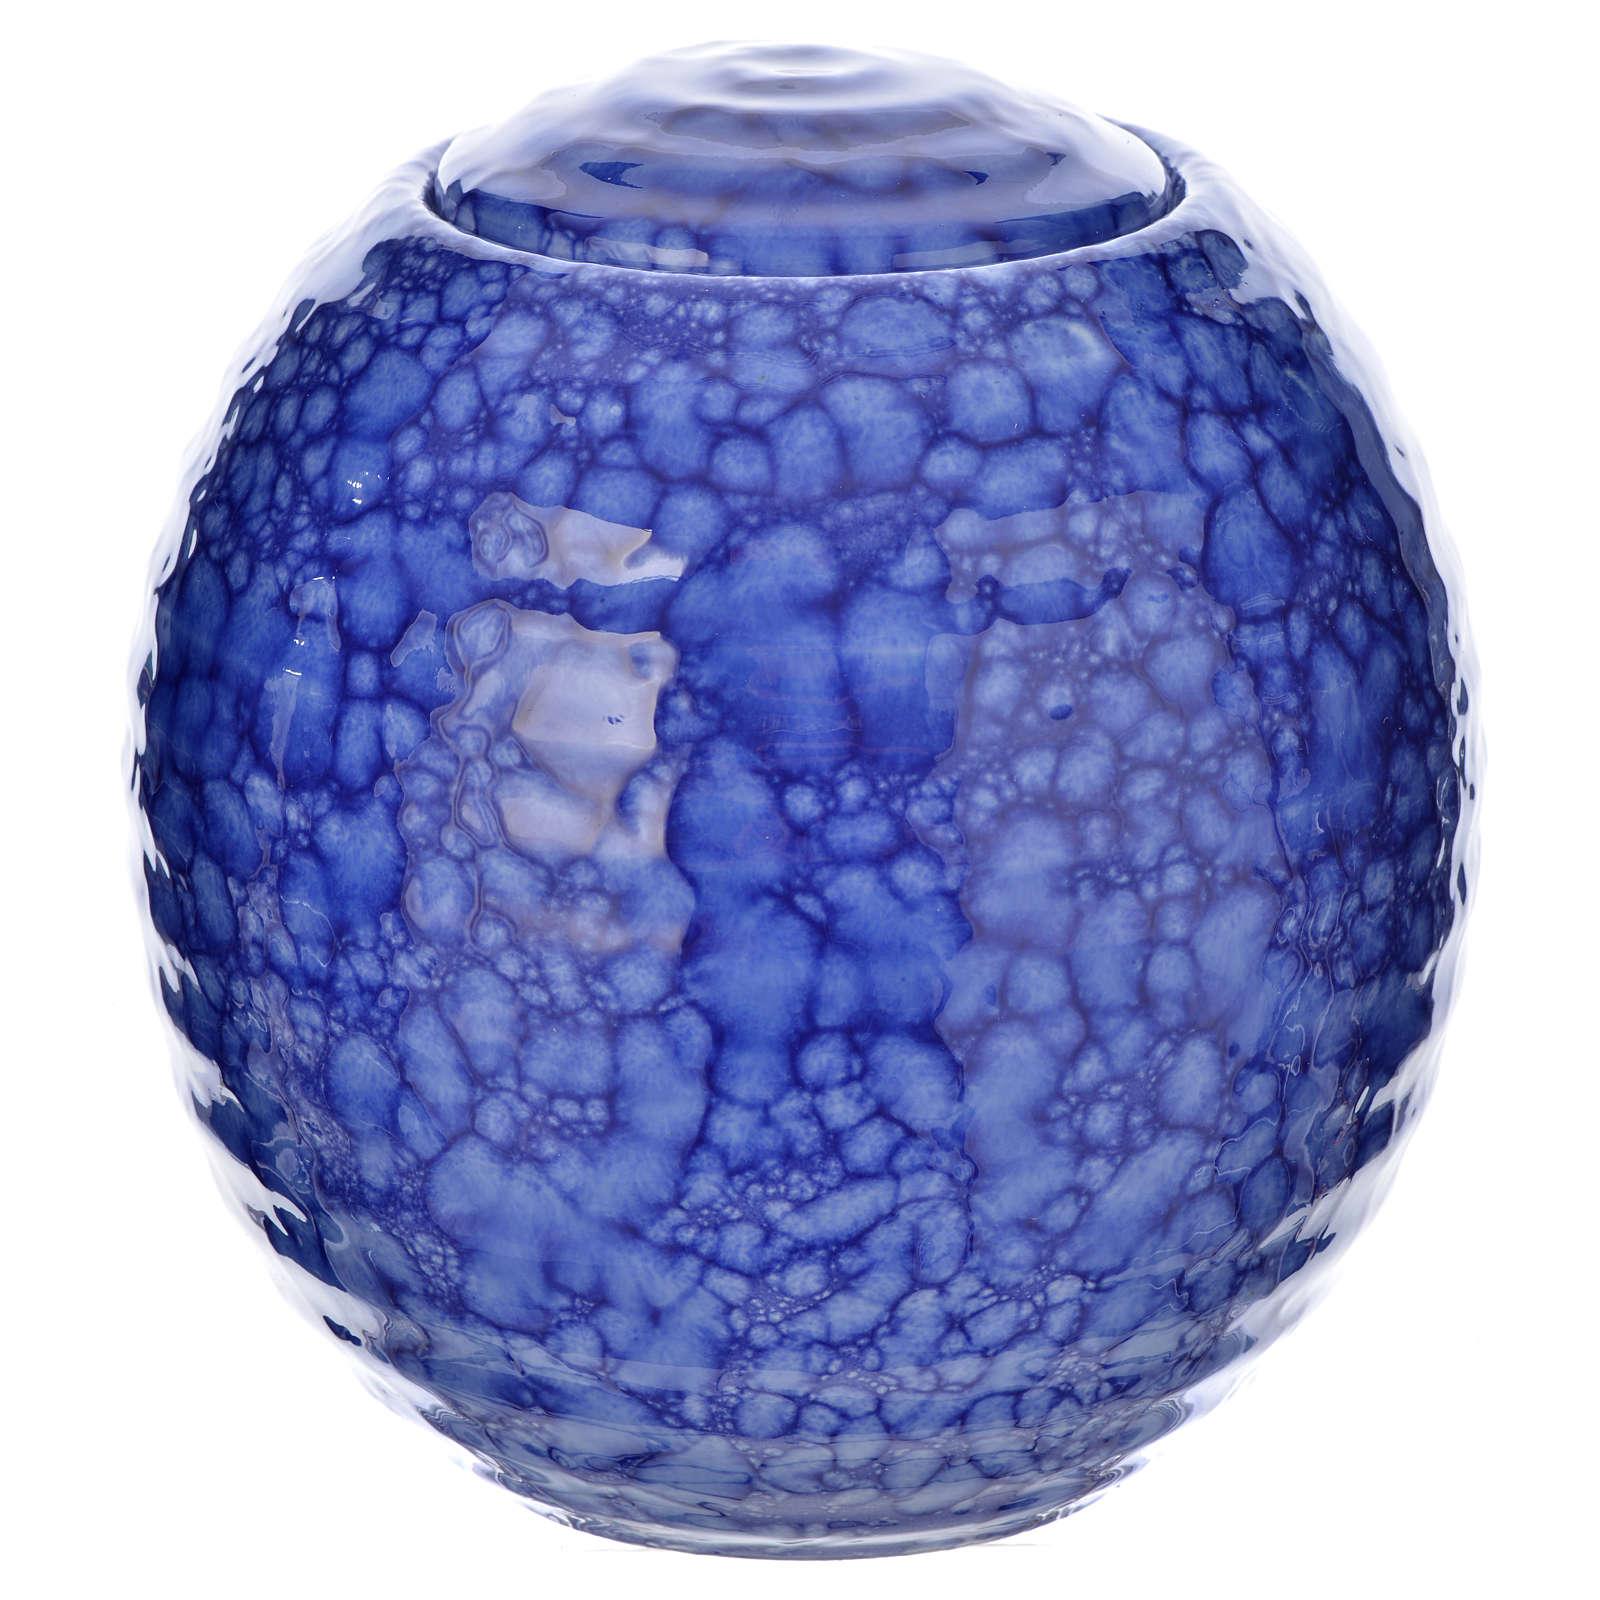 Urnetta funeraria porcellana smaltata mod. Murano Blu 3